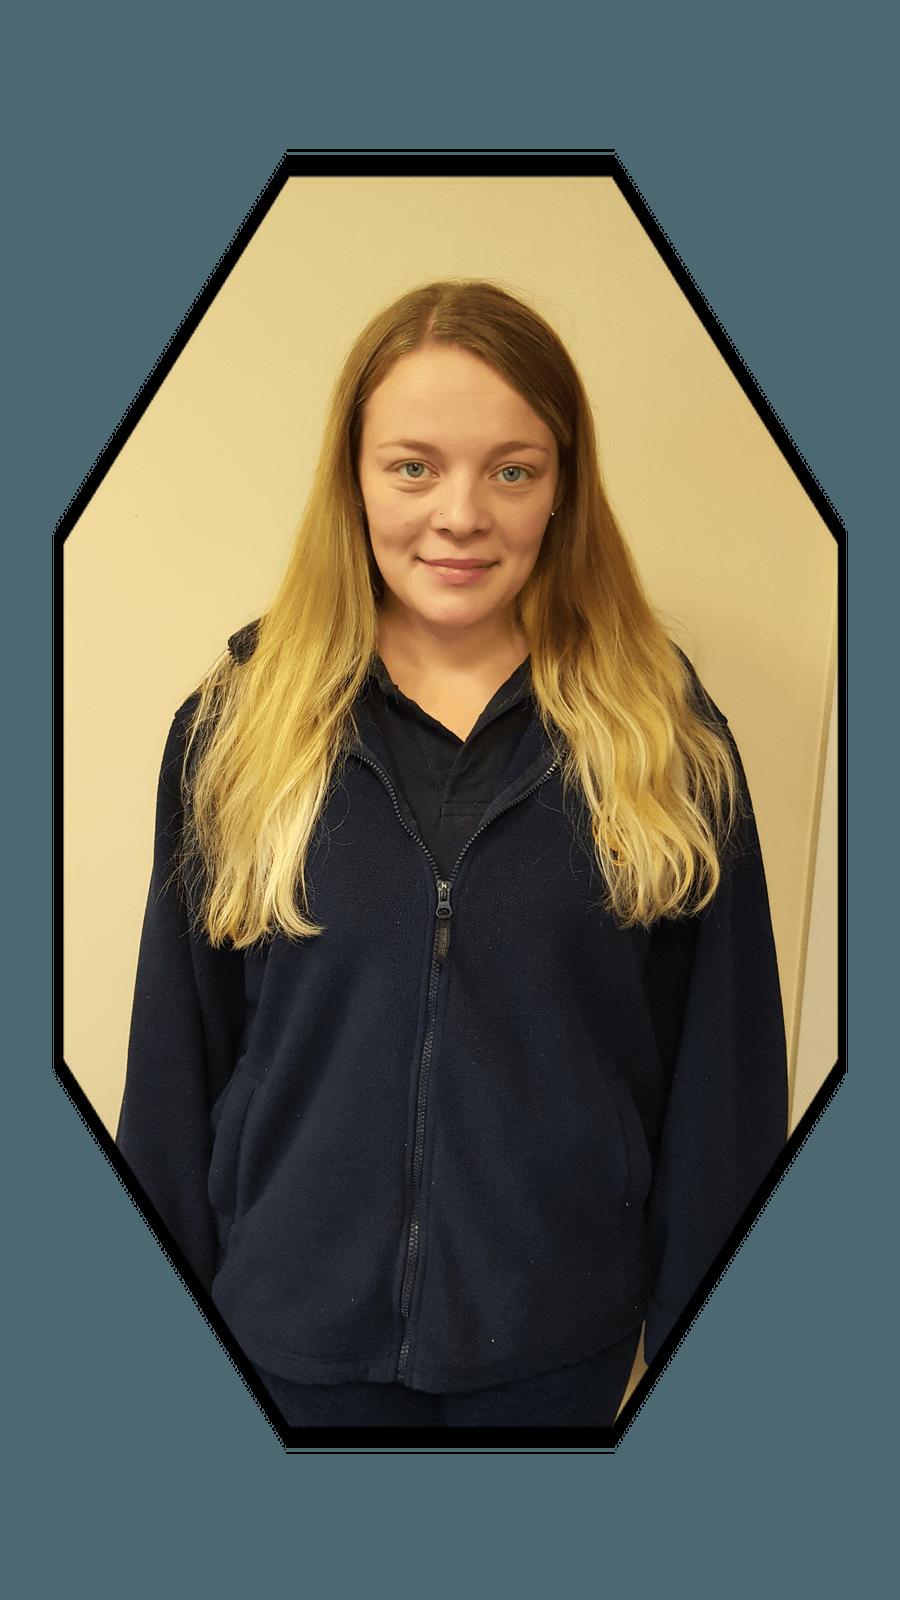 Evyan Baxter-Nursery Officer SEND